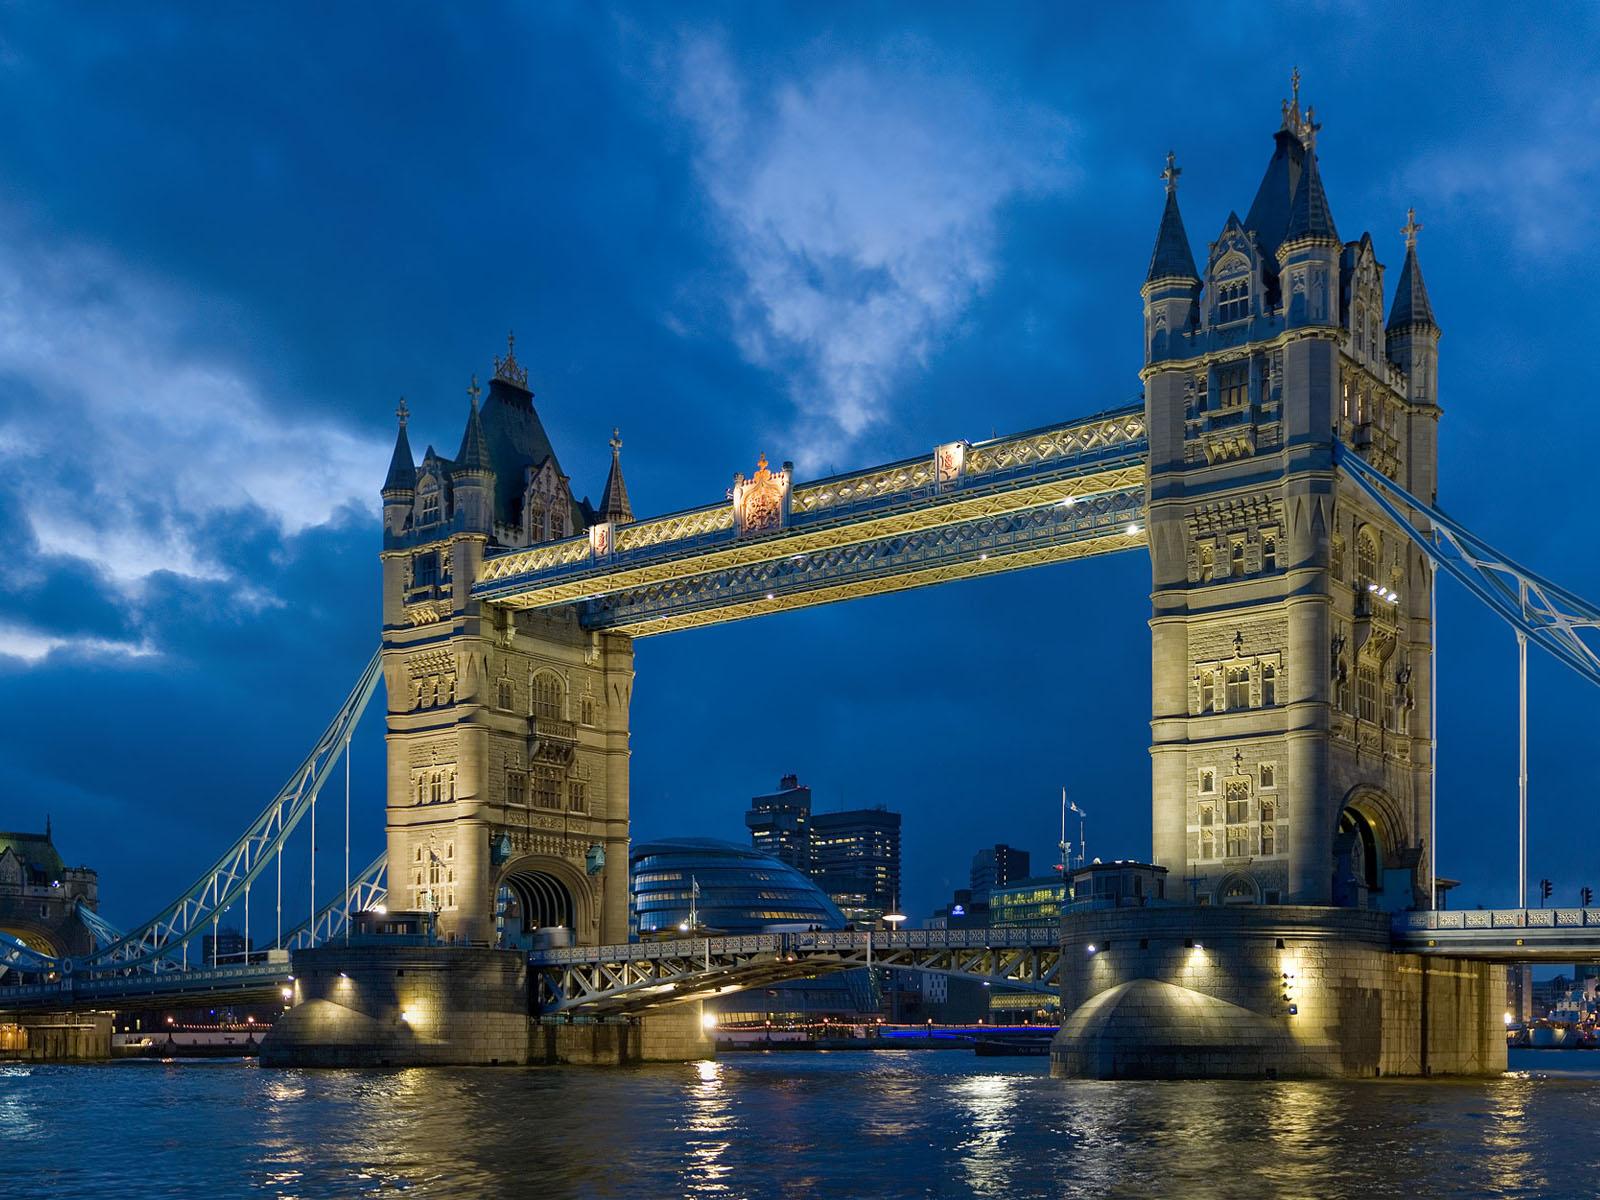 wallpapers tower bridge london wallpapers